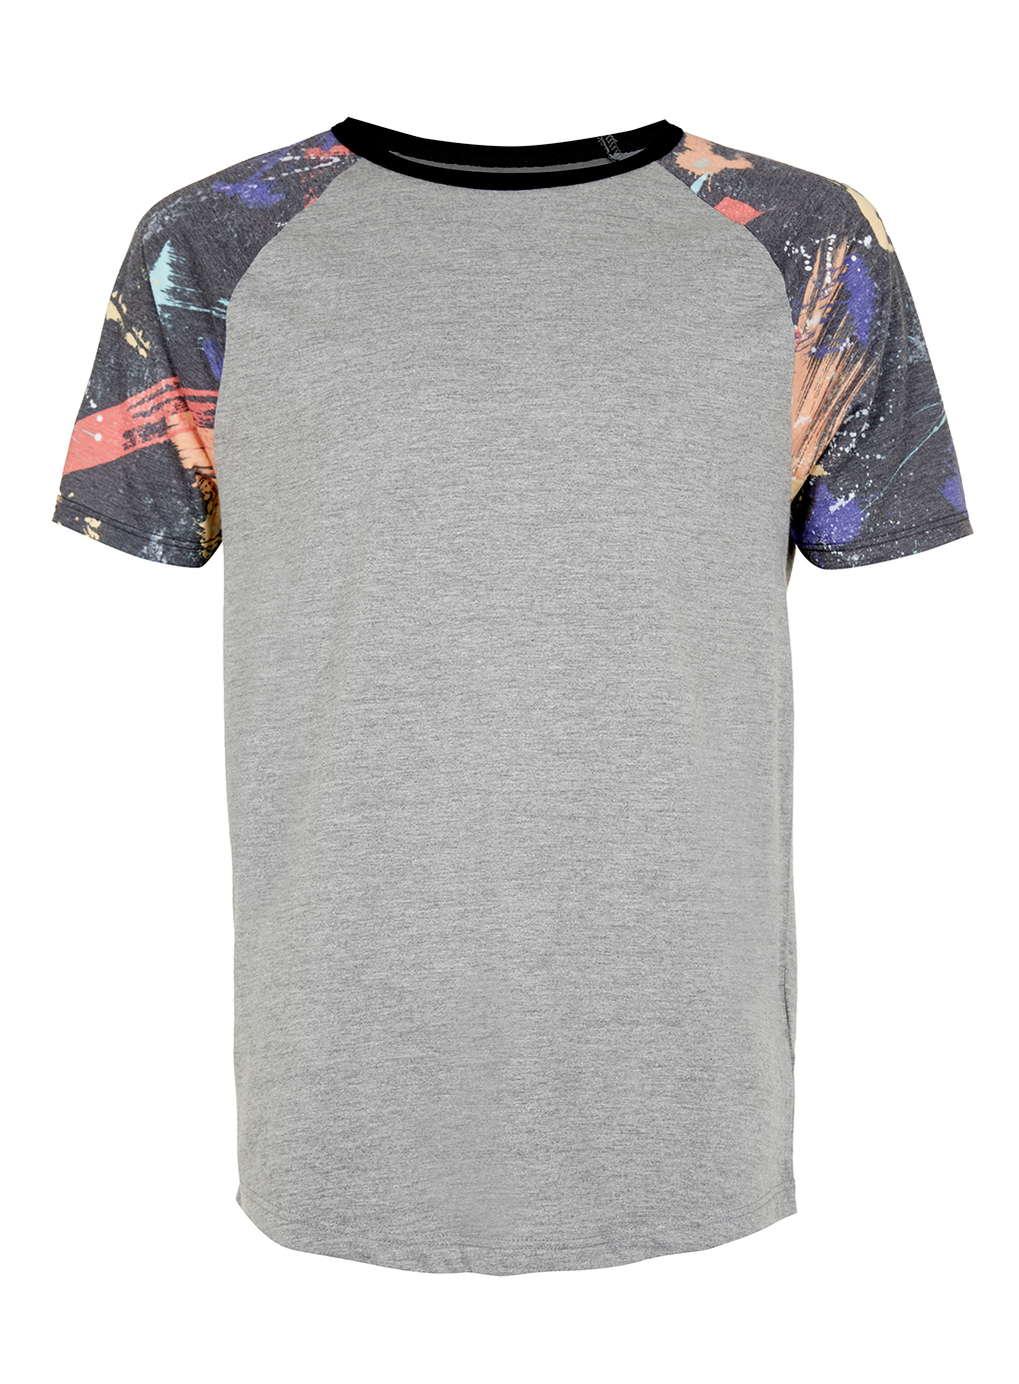 Topman grey marl galaxy print t shirt in gray for men mid for Grey marl t shirt